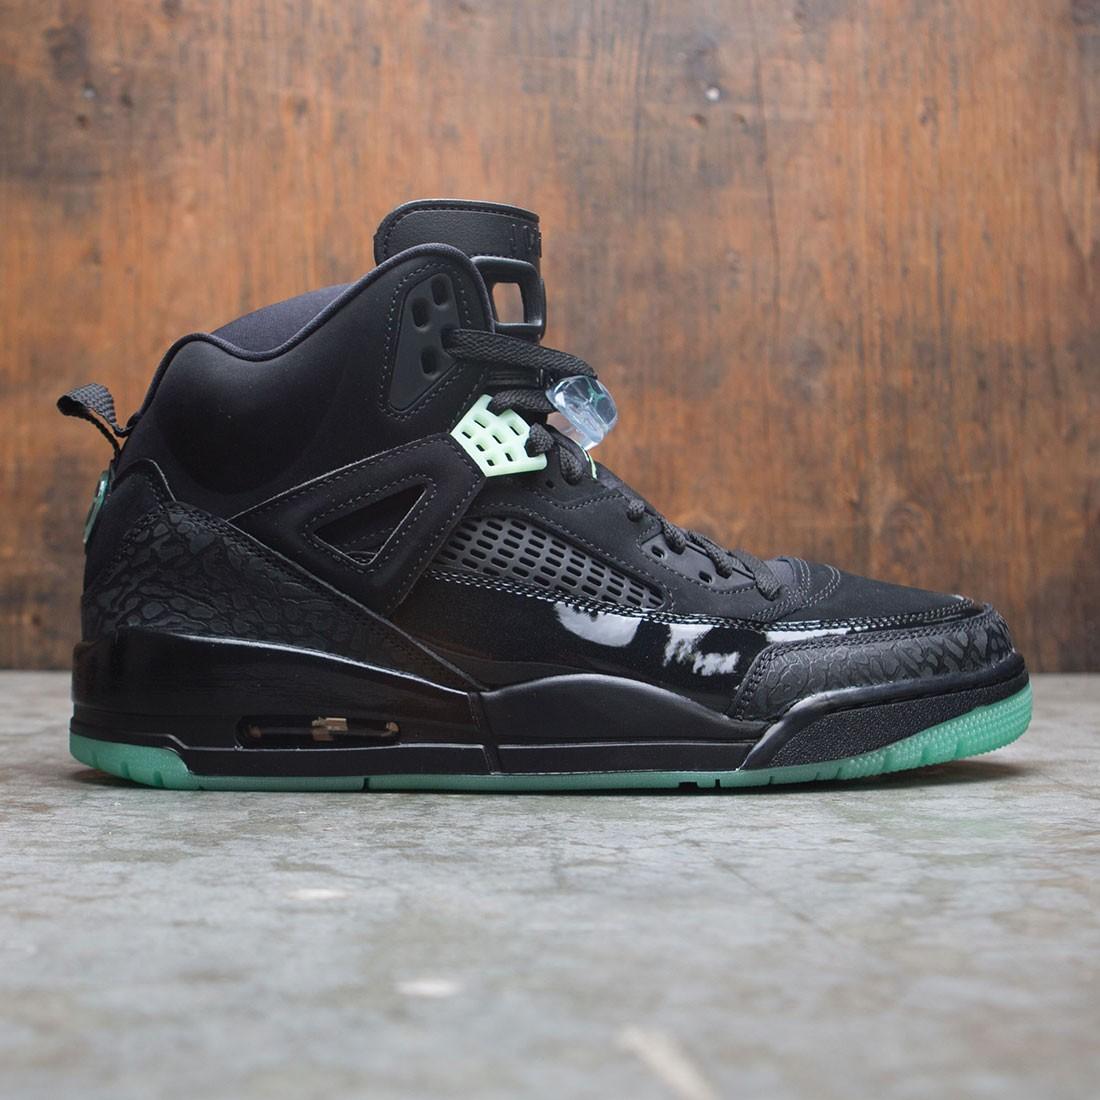 wholesale dealer c97e0 4a0c9 Jordan Men Spizike (black / green glow-anthracite)